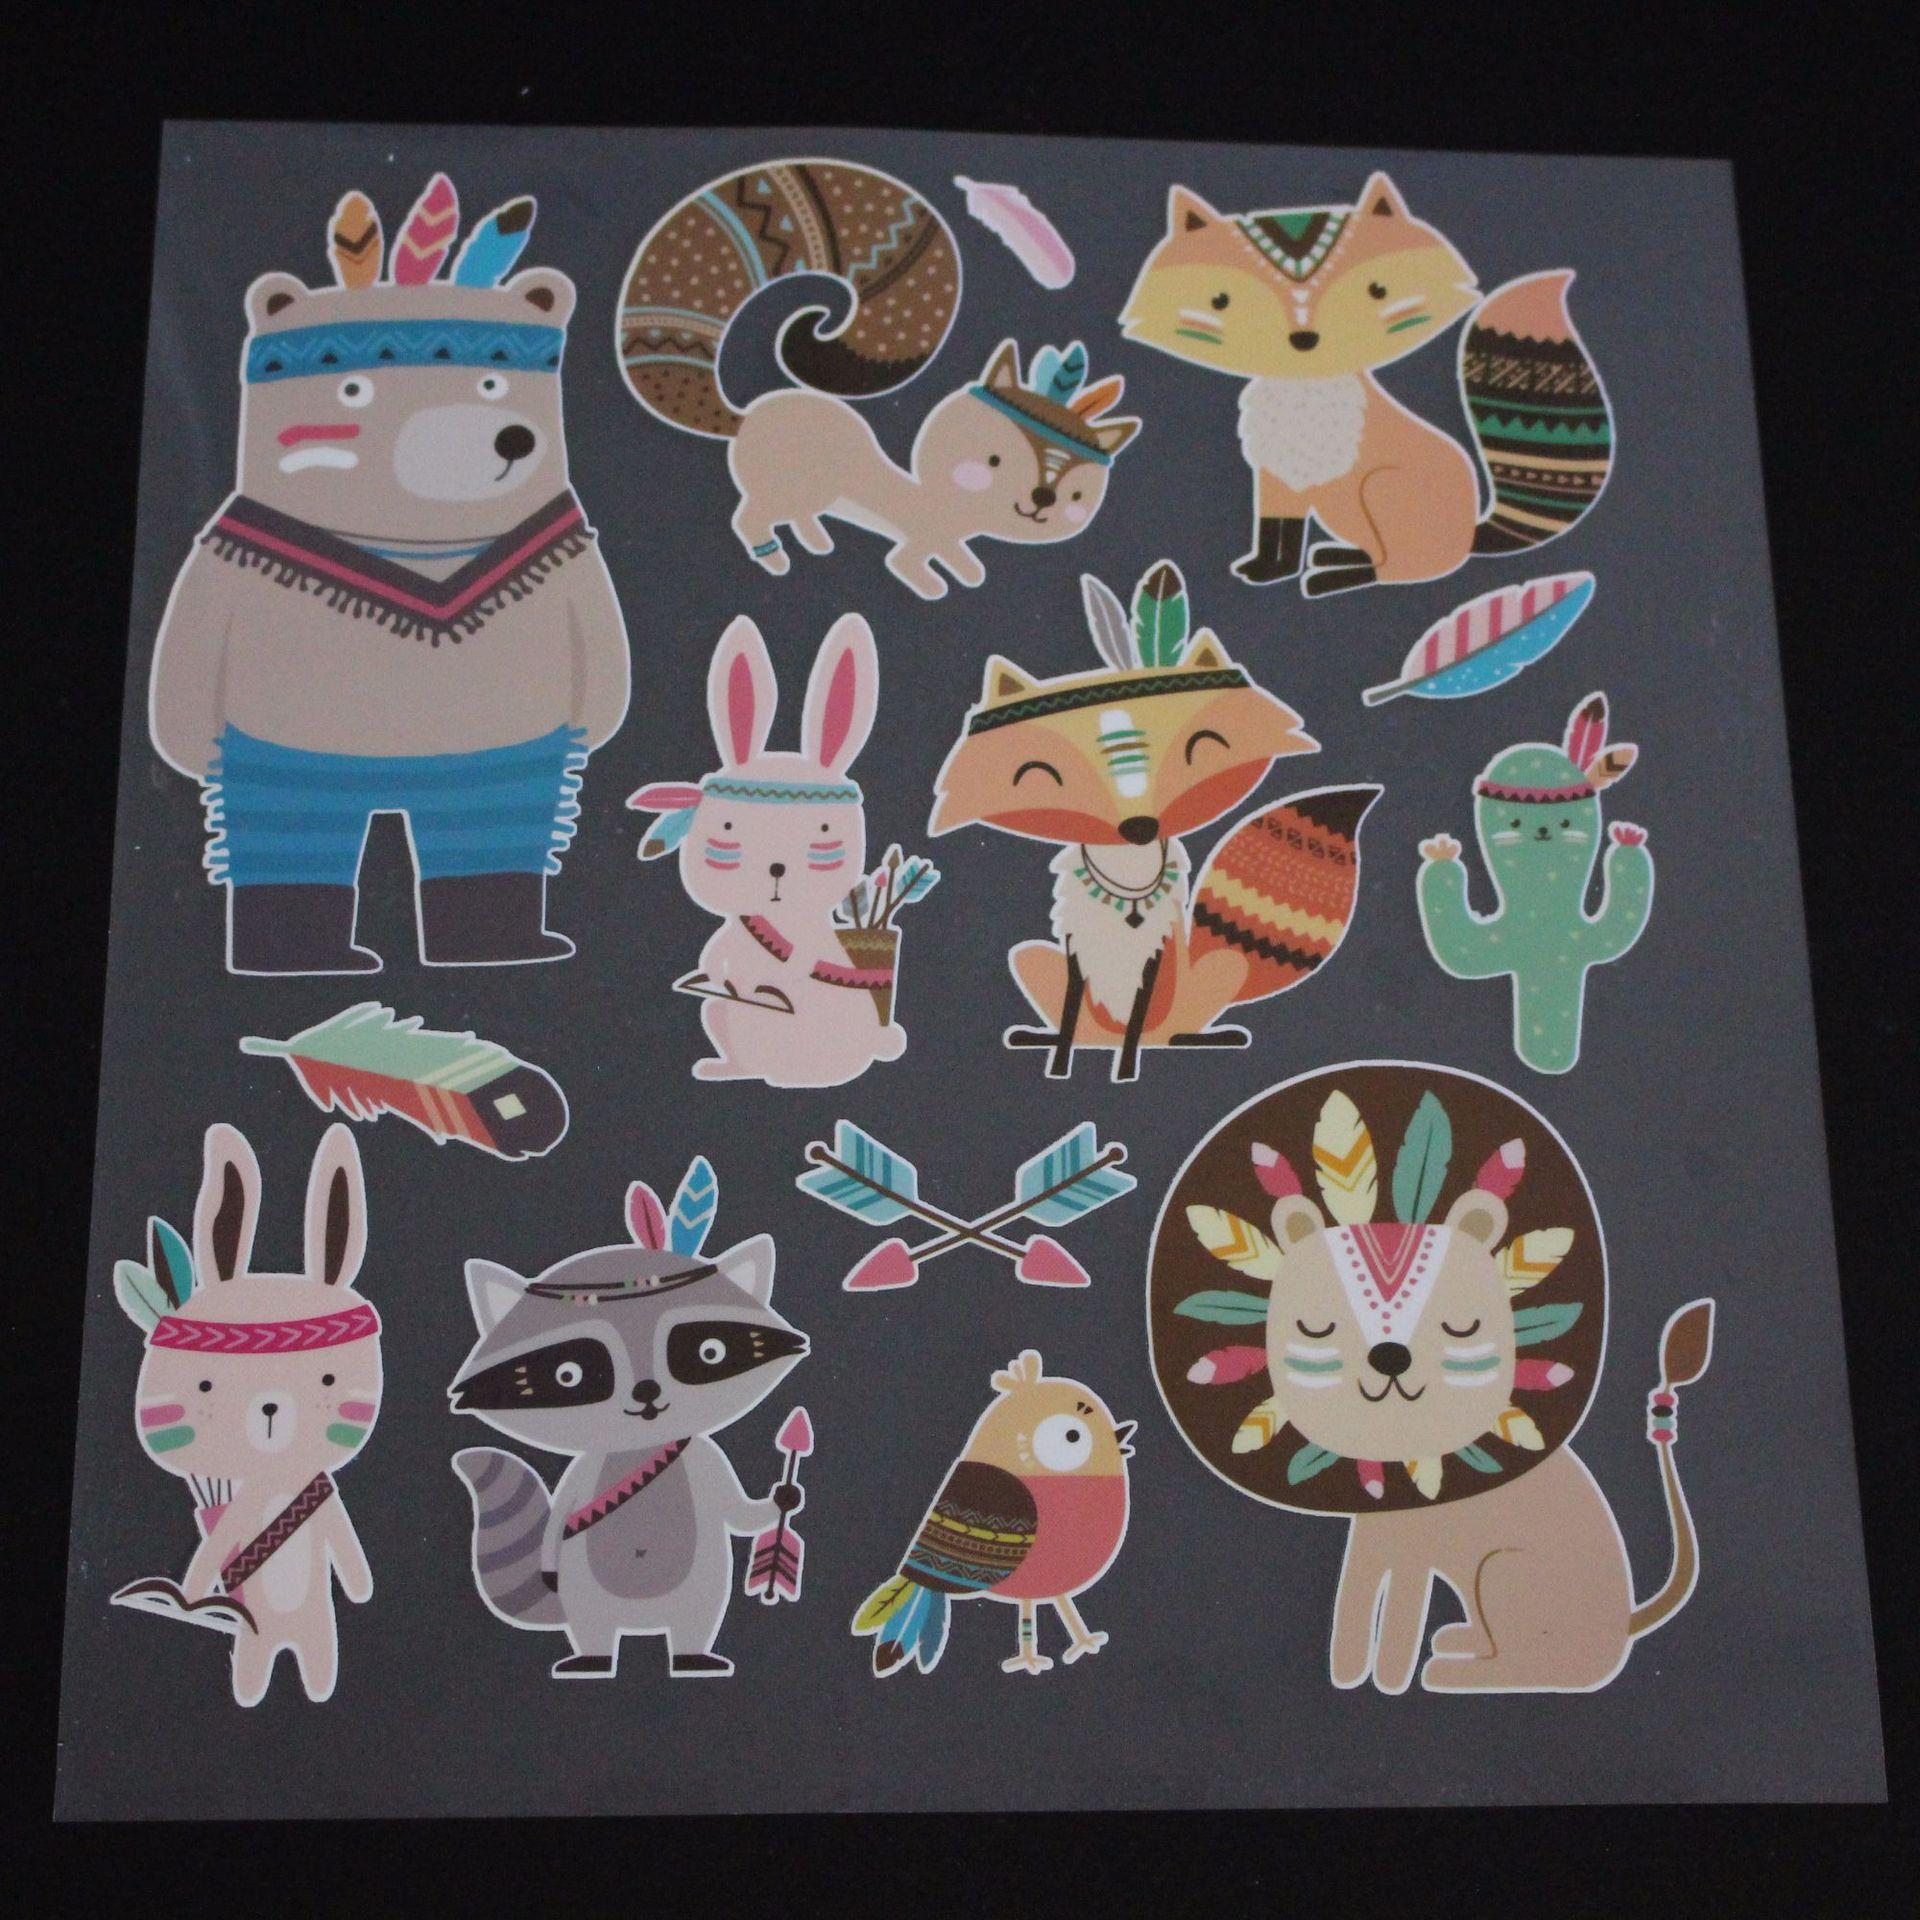 Feather Stencil Rhinestones Accessories For Clothing Heat Transfer Rhinestones For T shirt Print Flatback Cloth Art Decoration in Rhinestones from Home Garden